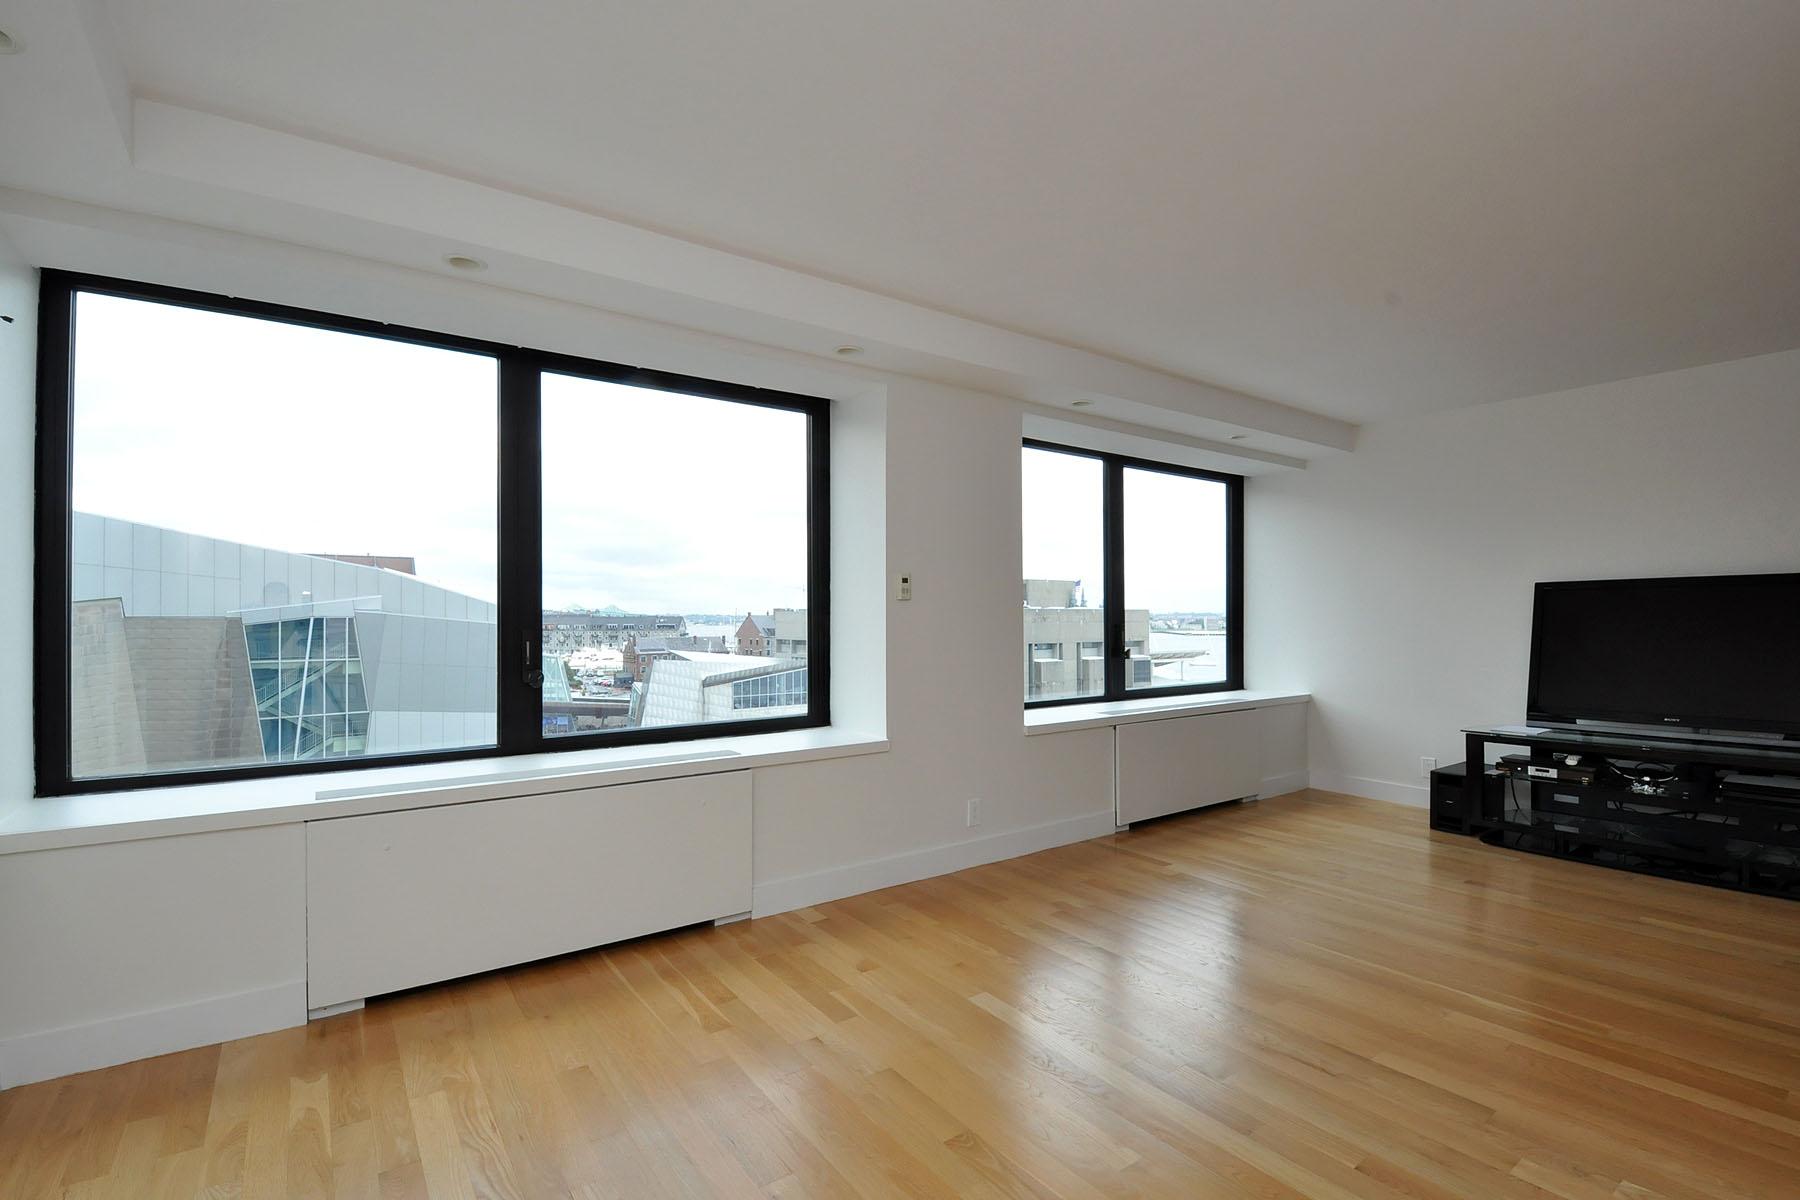 Condominium for Sale at Captivating Waterfront High Rise Condominium 85 East India Row Unit 5H Waterfront, Boston, Massachusetts 02110 United States